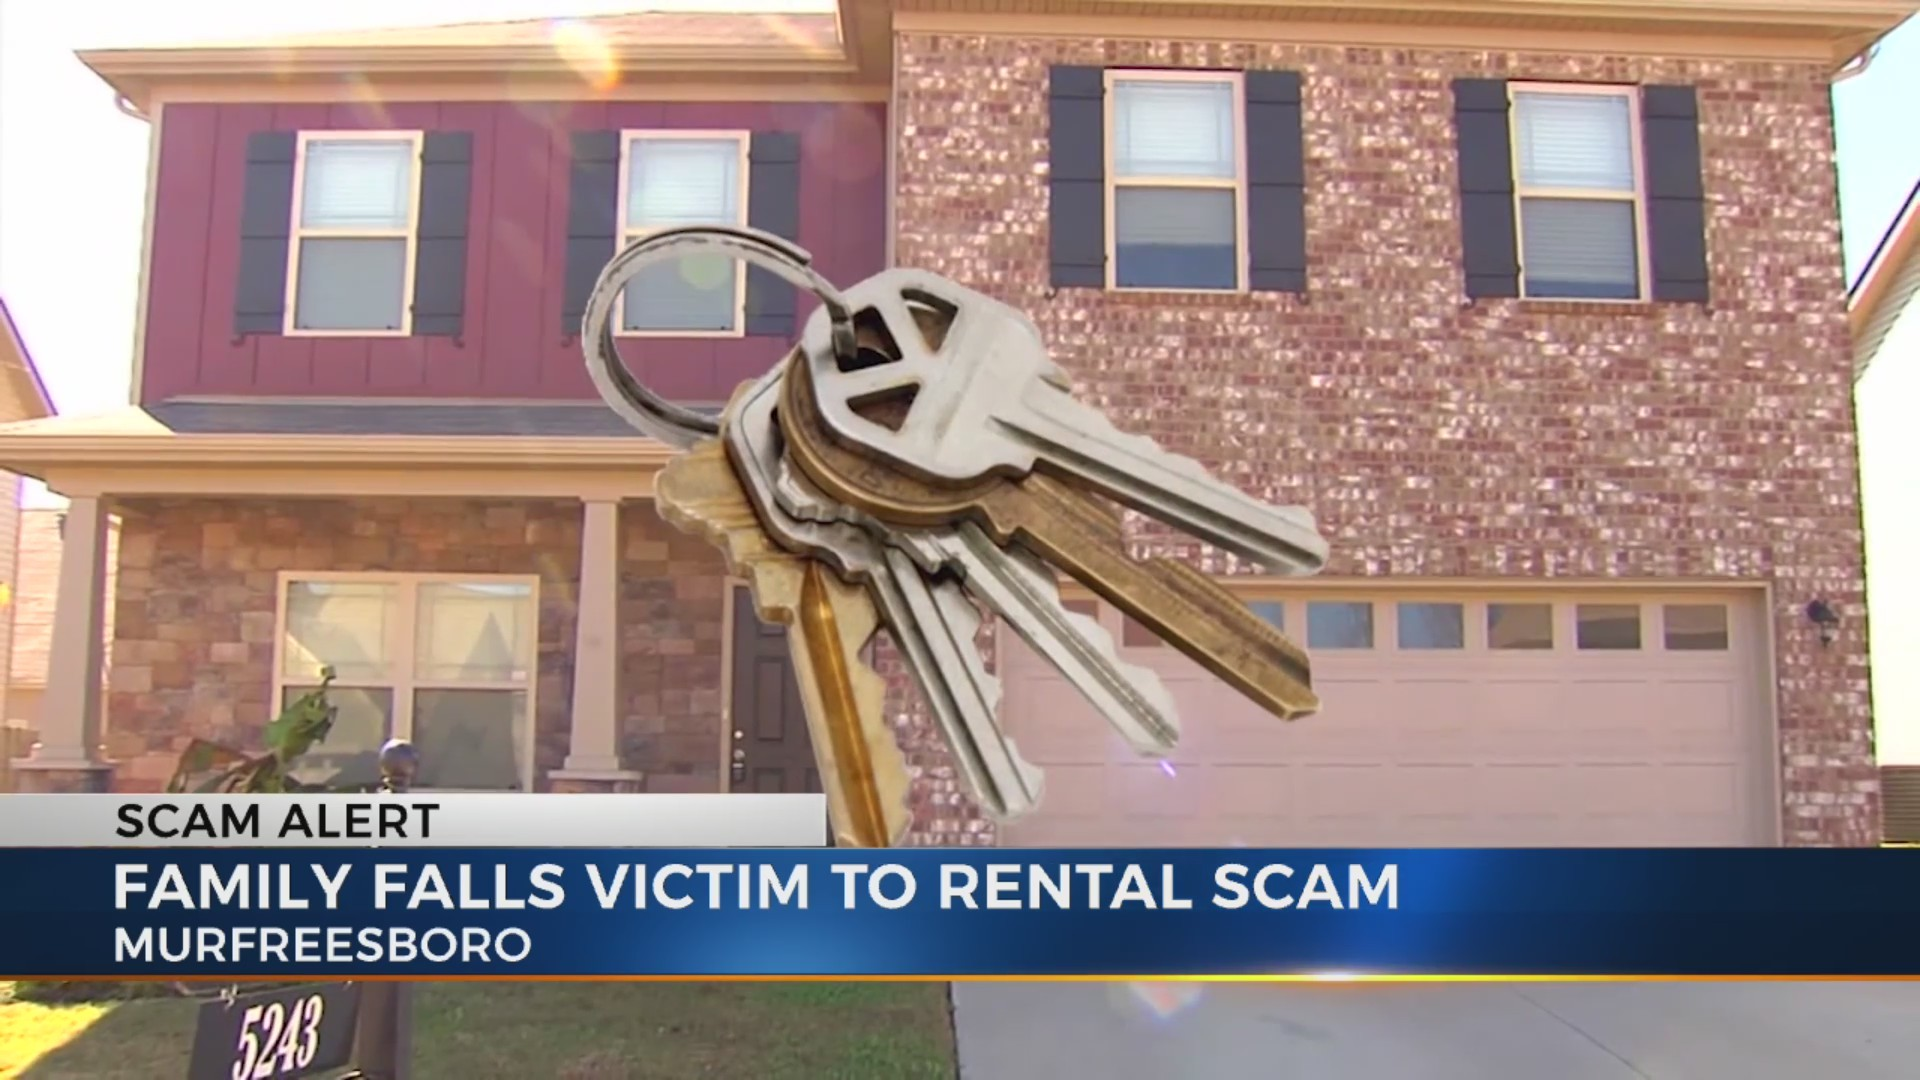 Home rental scam